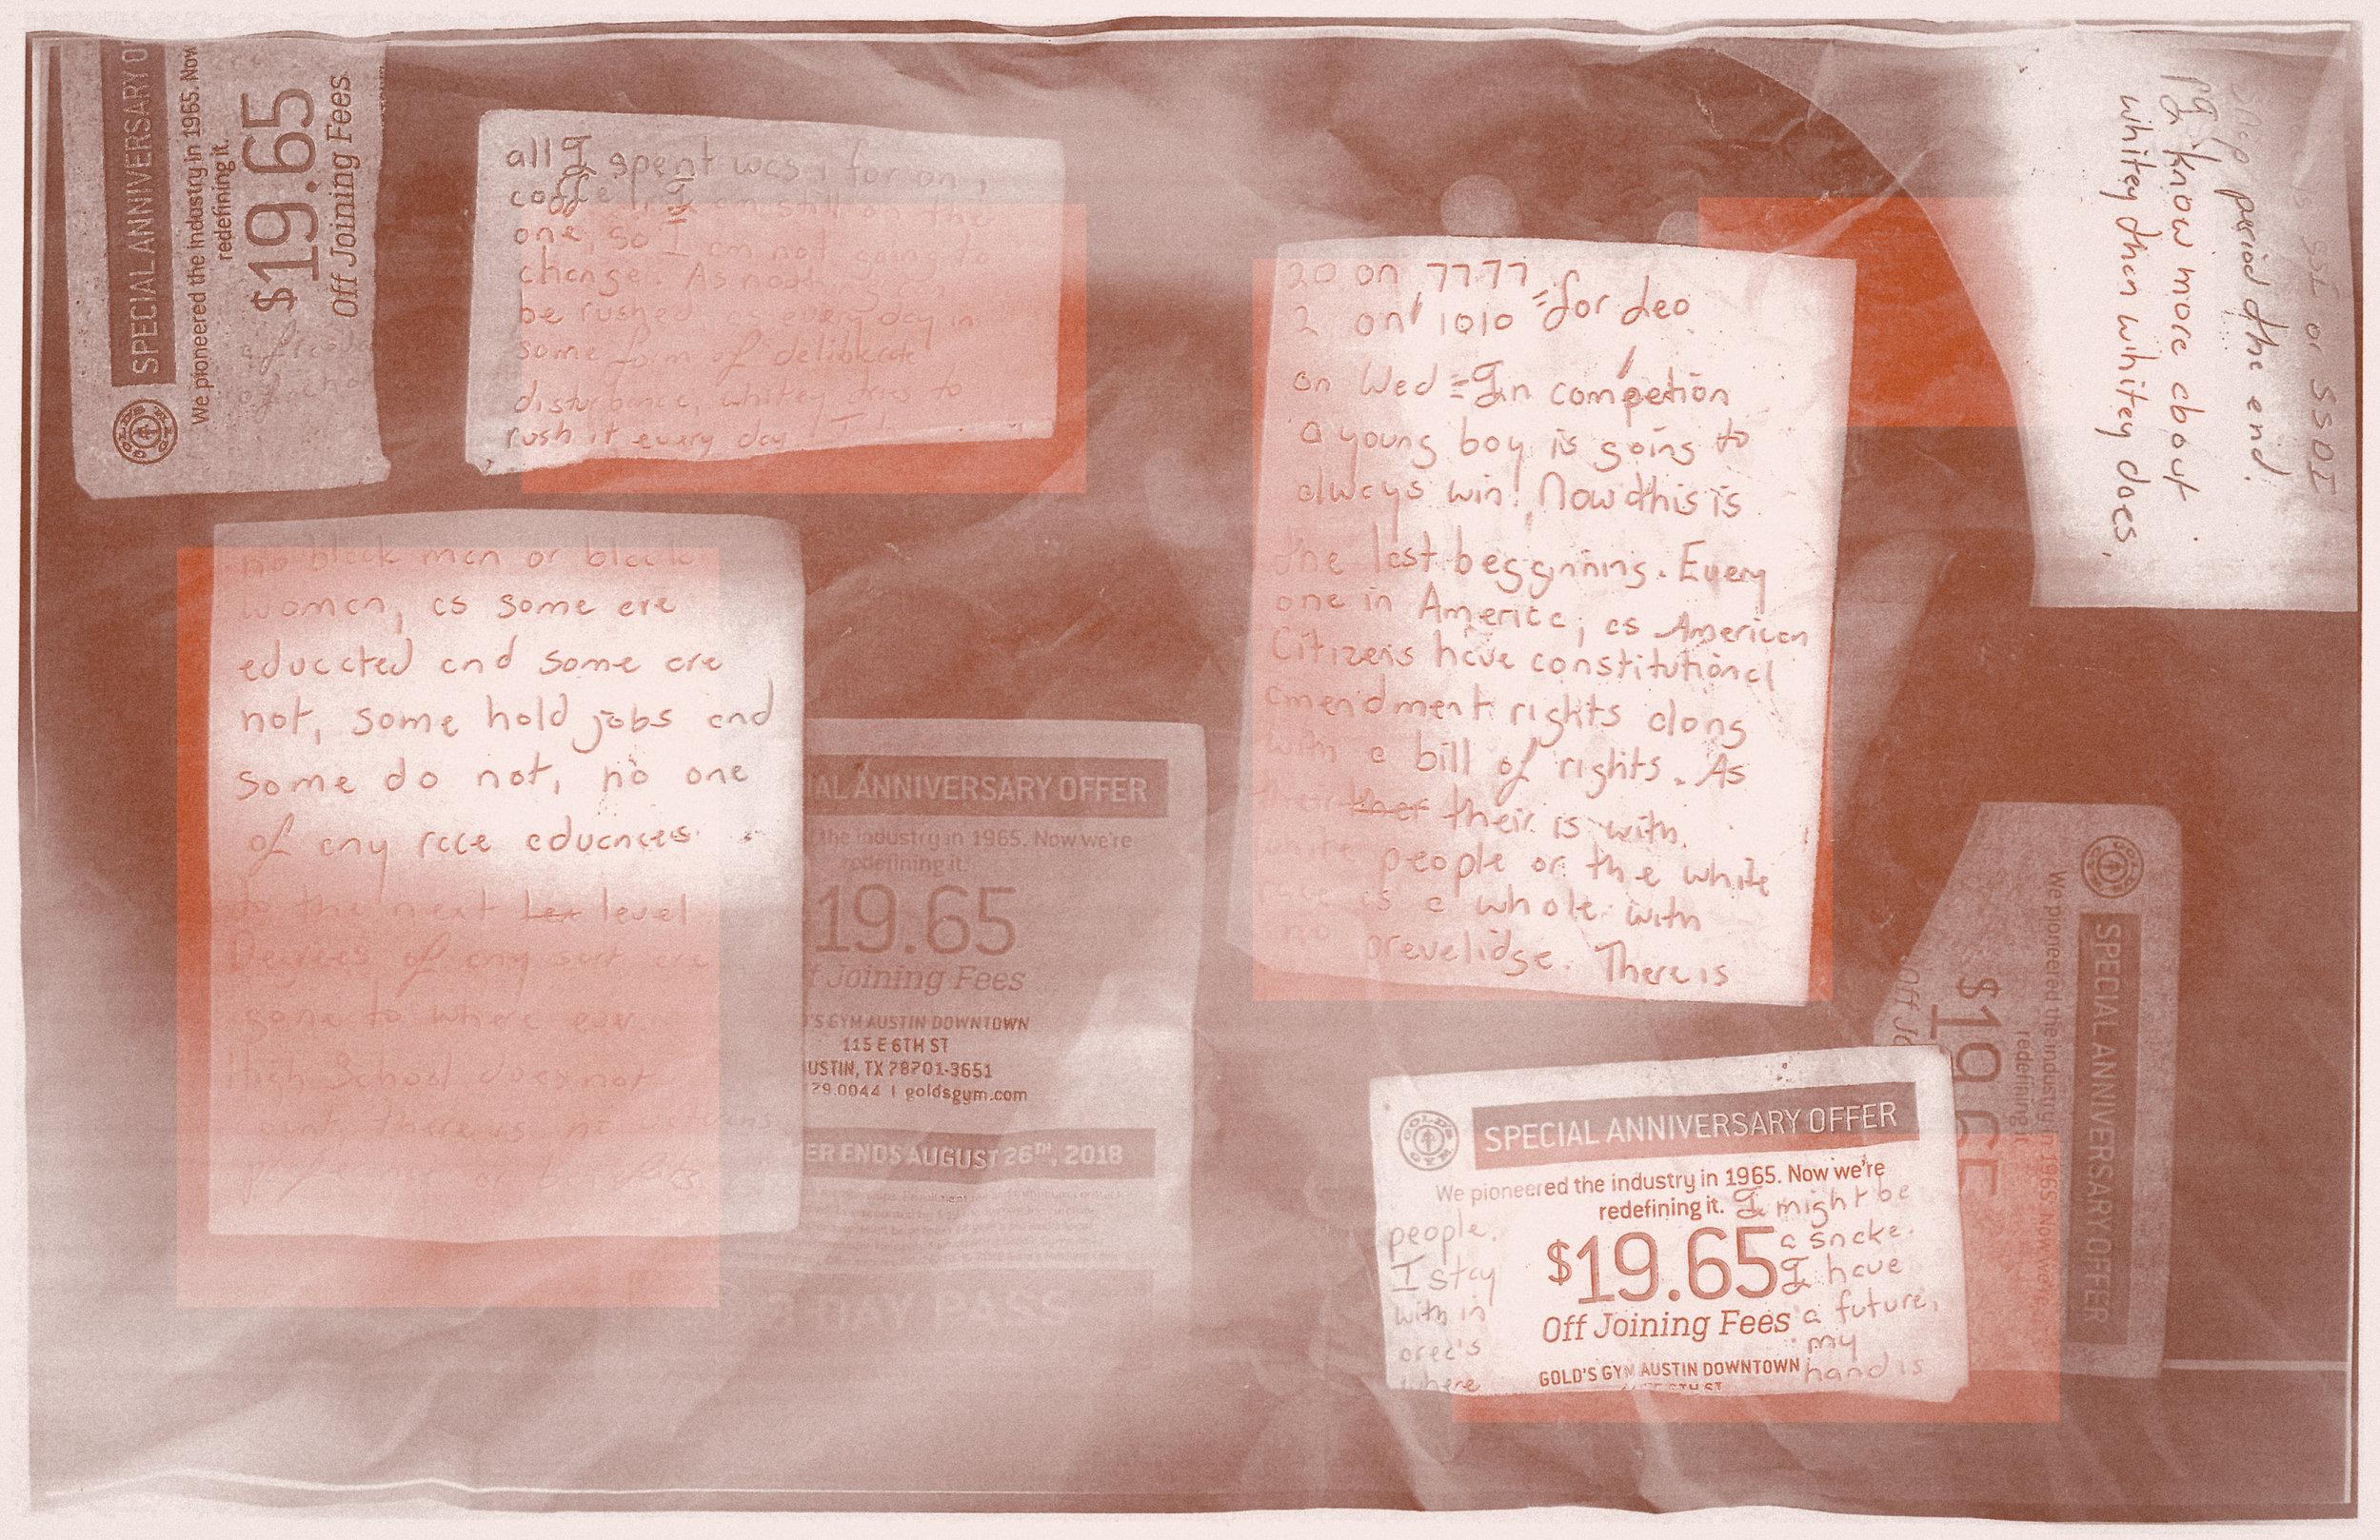 SKMBT_C65418081819380-1.jpg